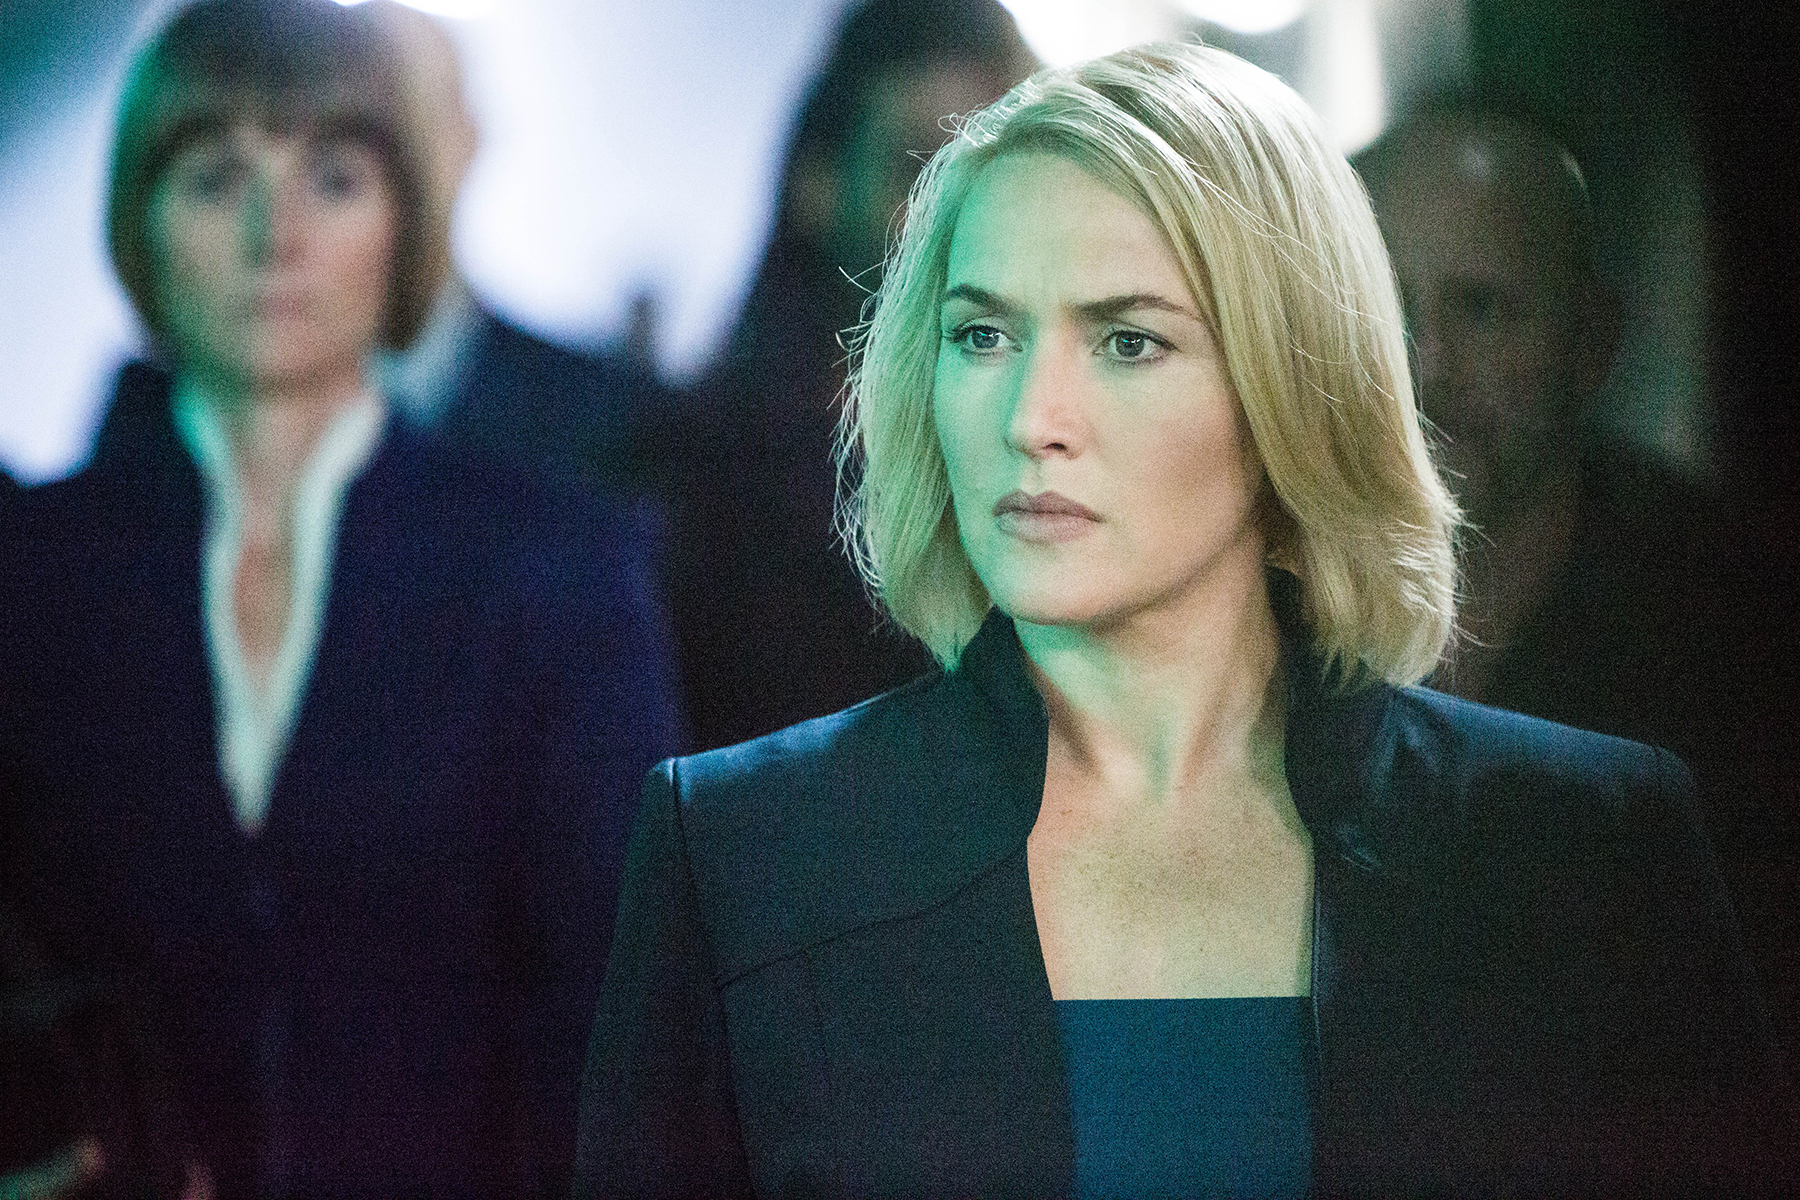 Kate Winslet in Divergent.